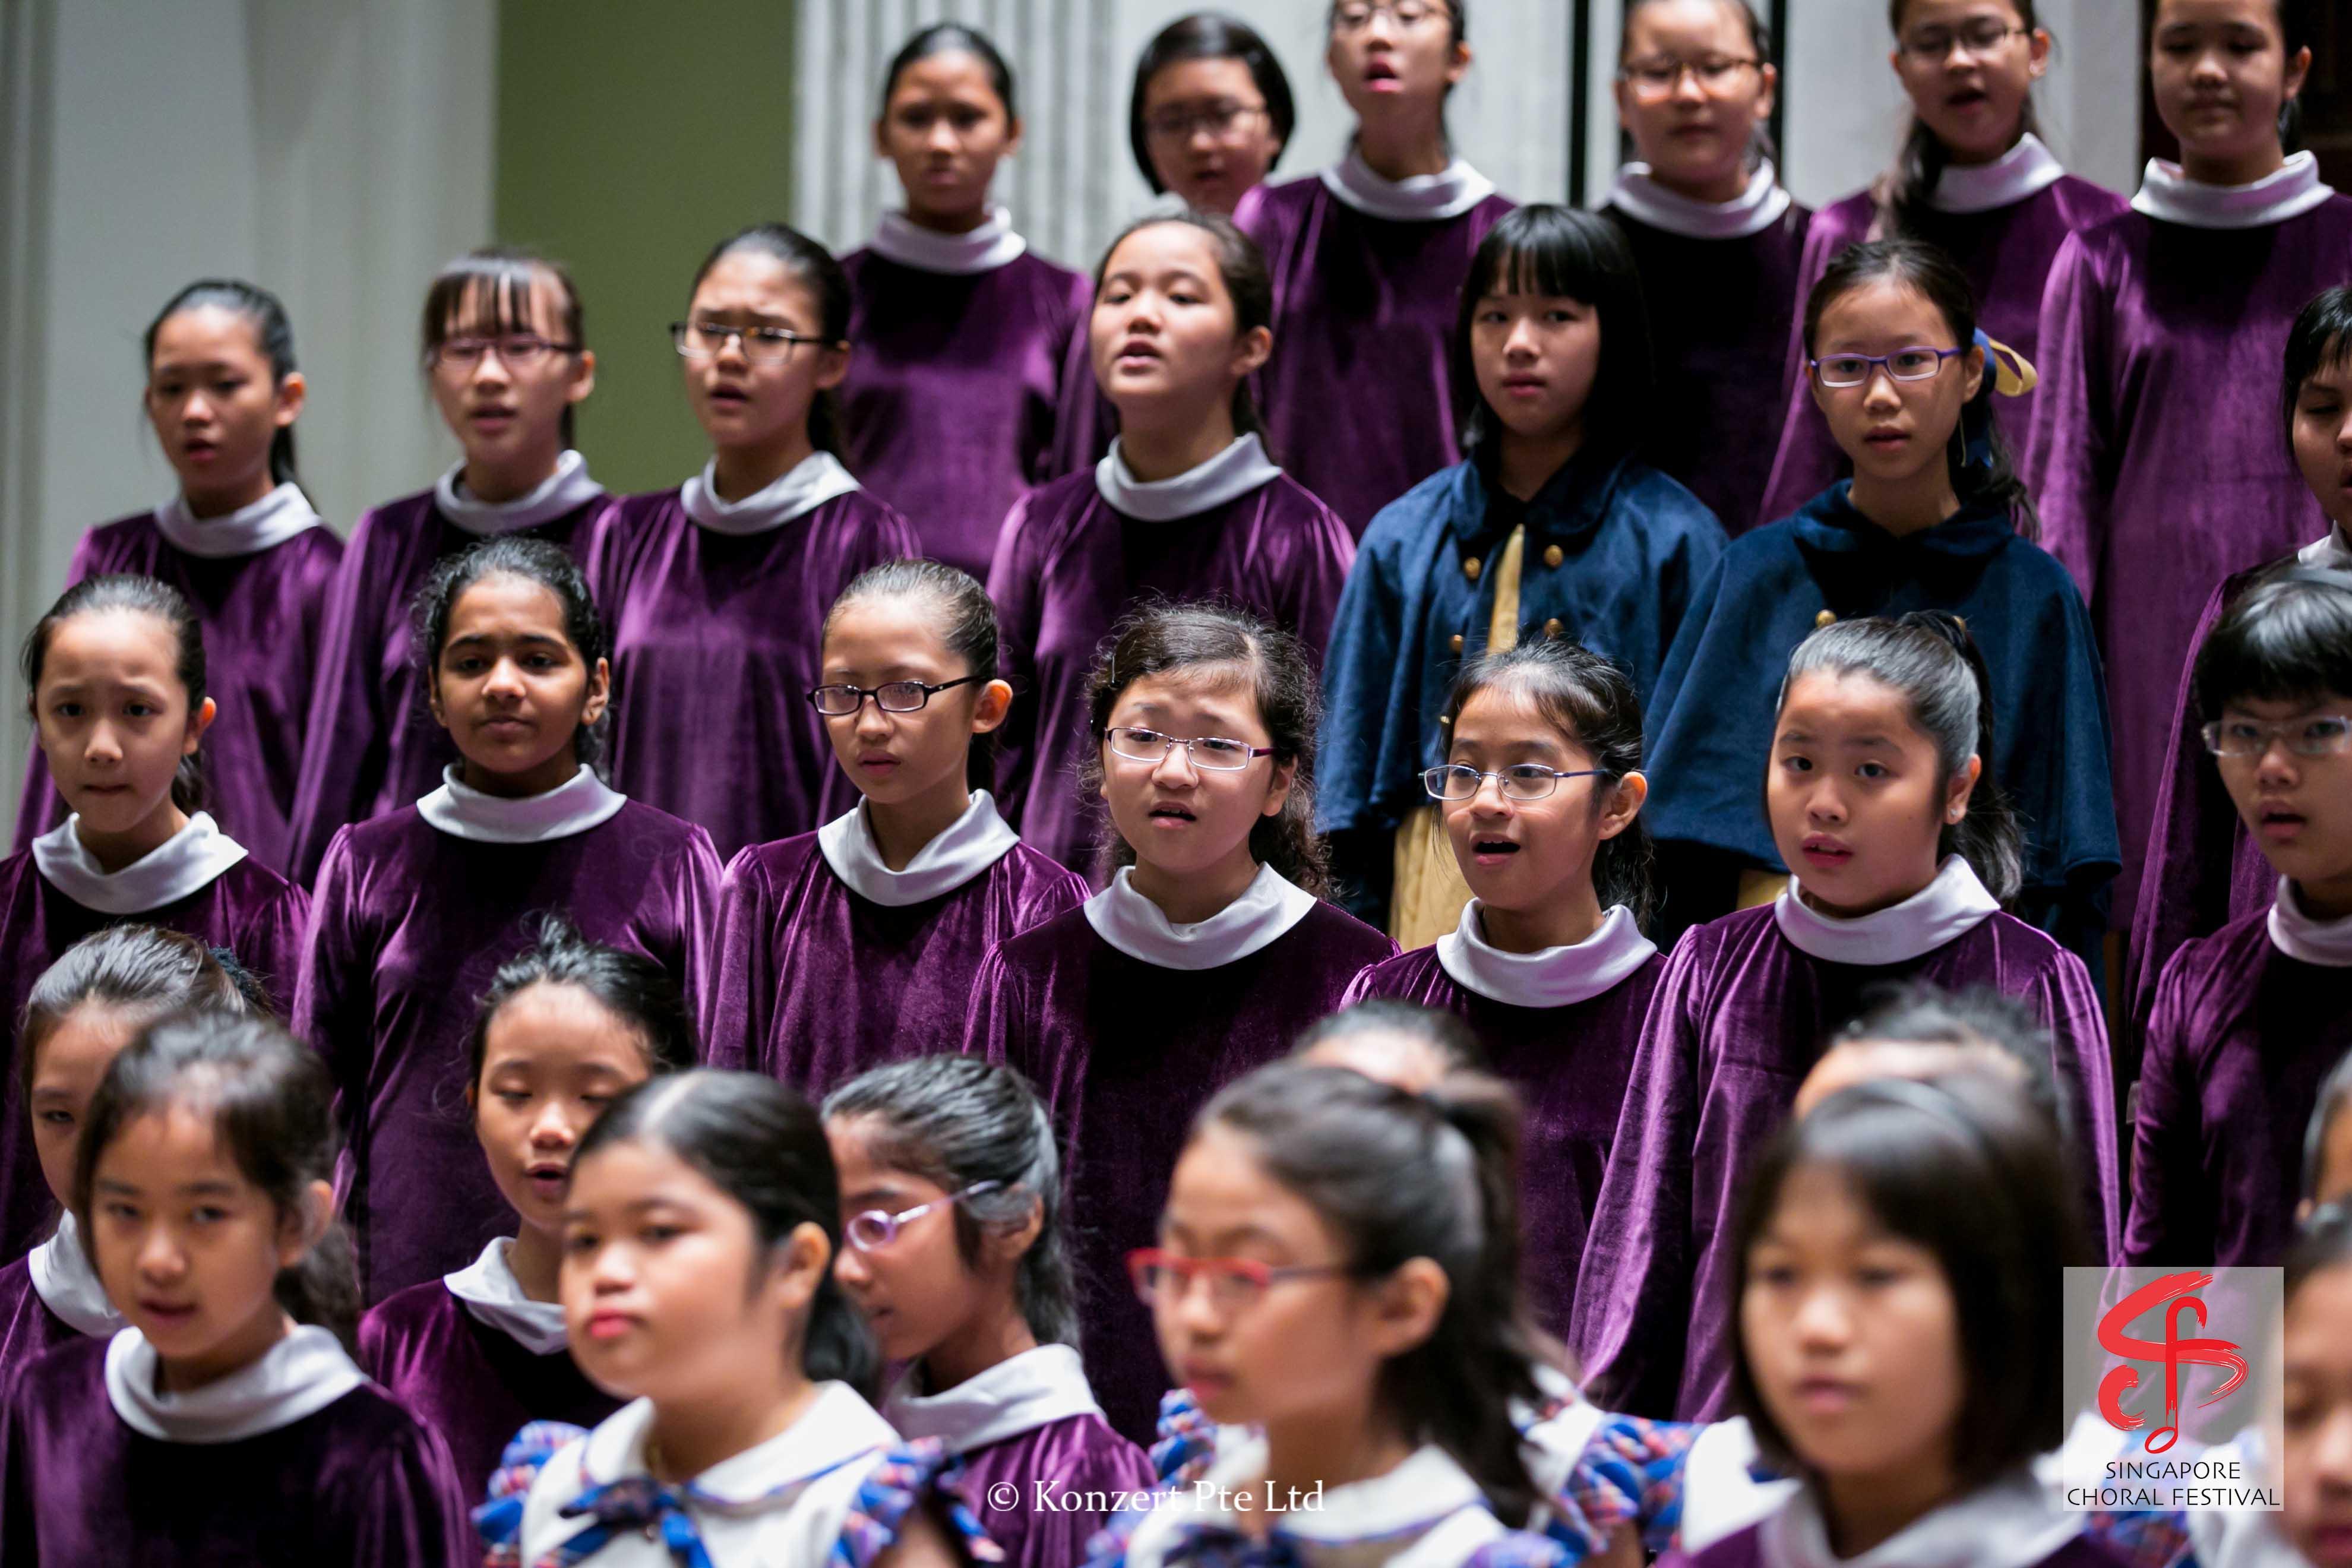 Singapore Choral Festival 8-8-15 (17).jpg